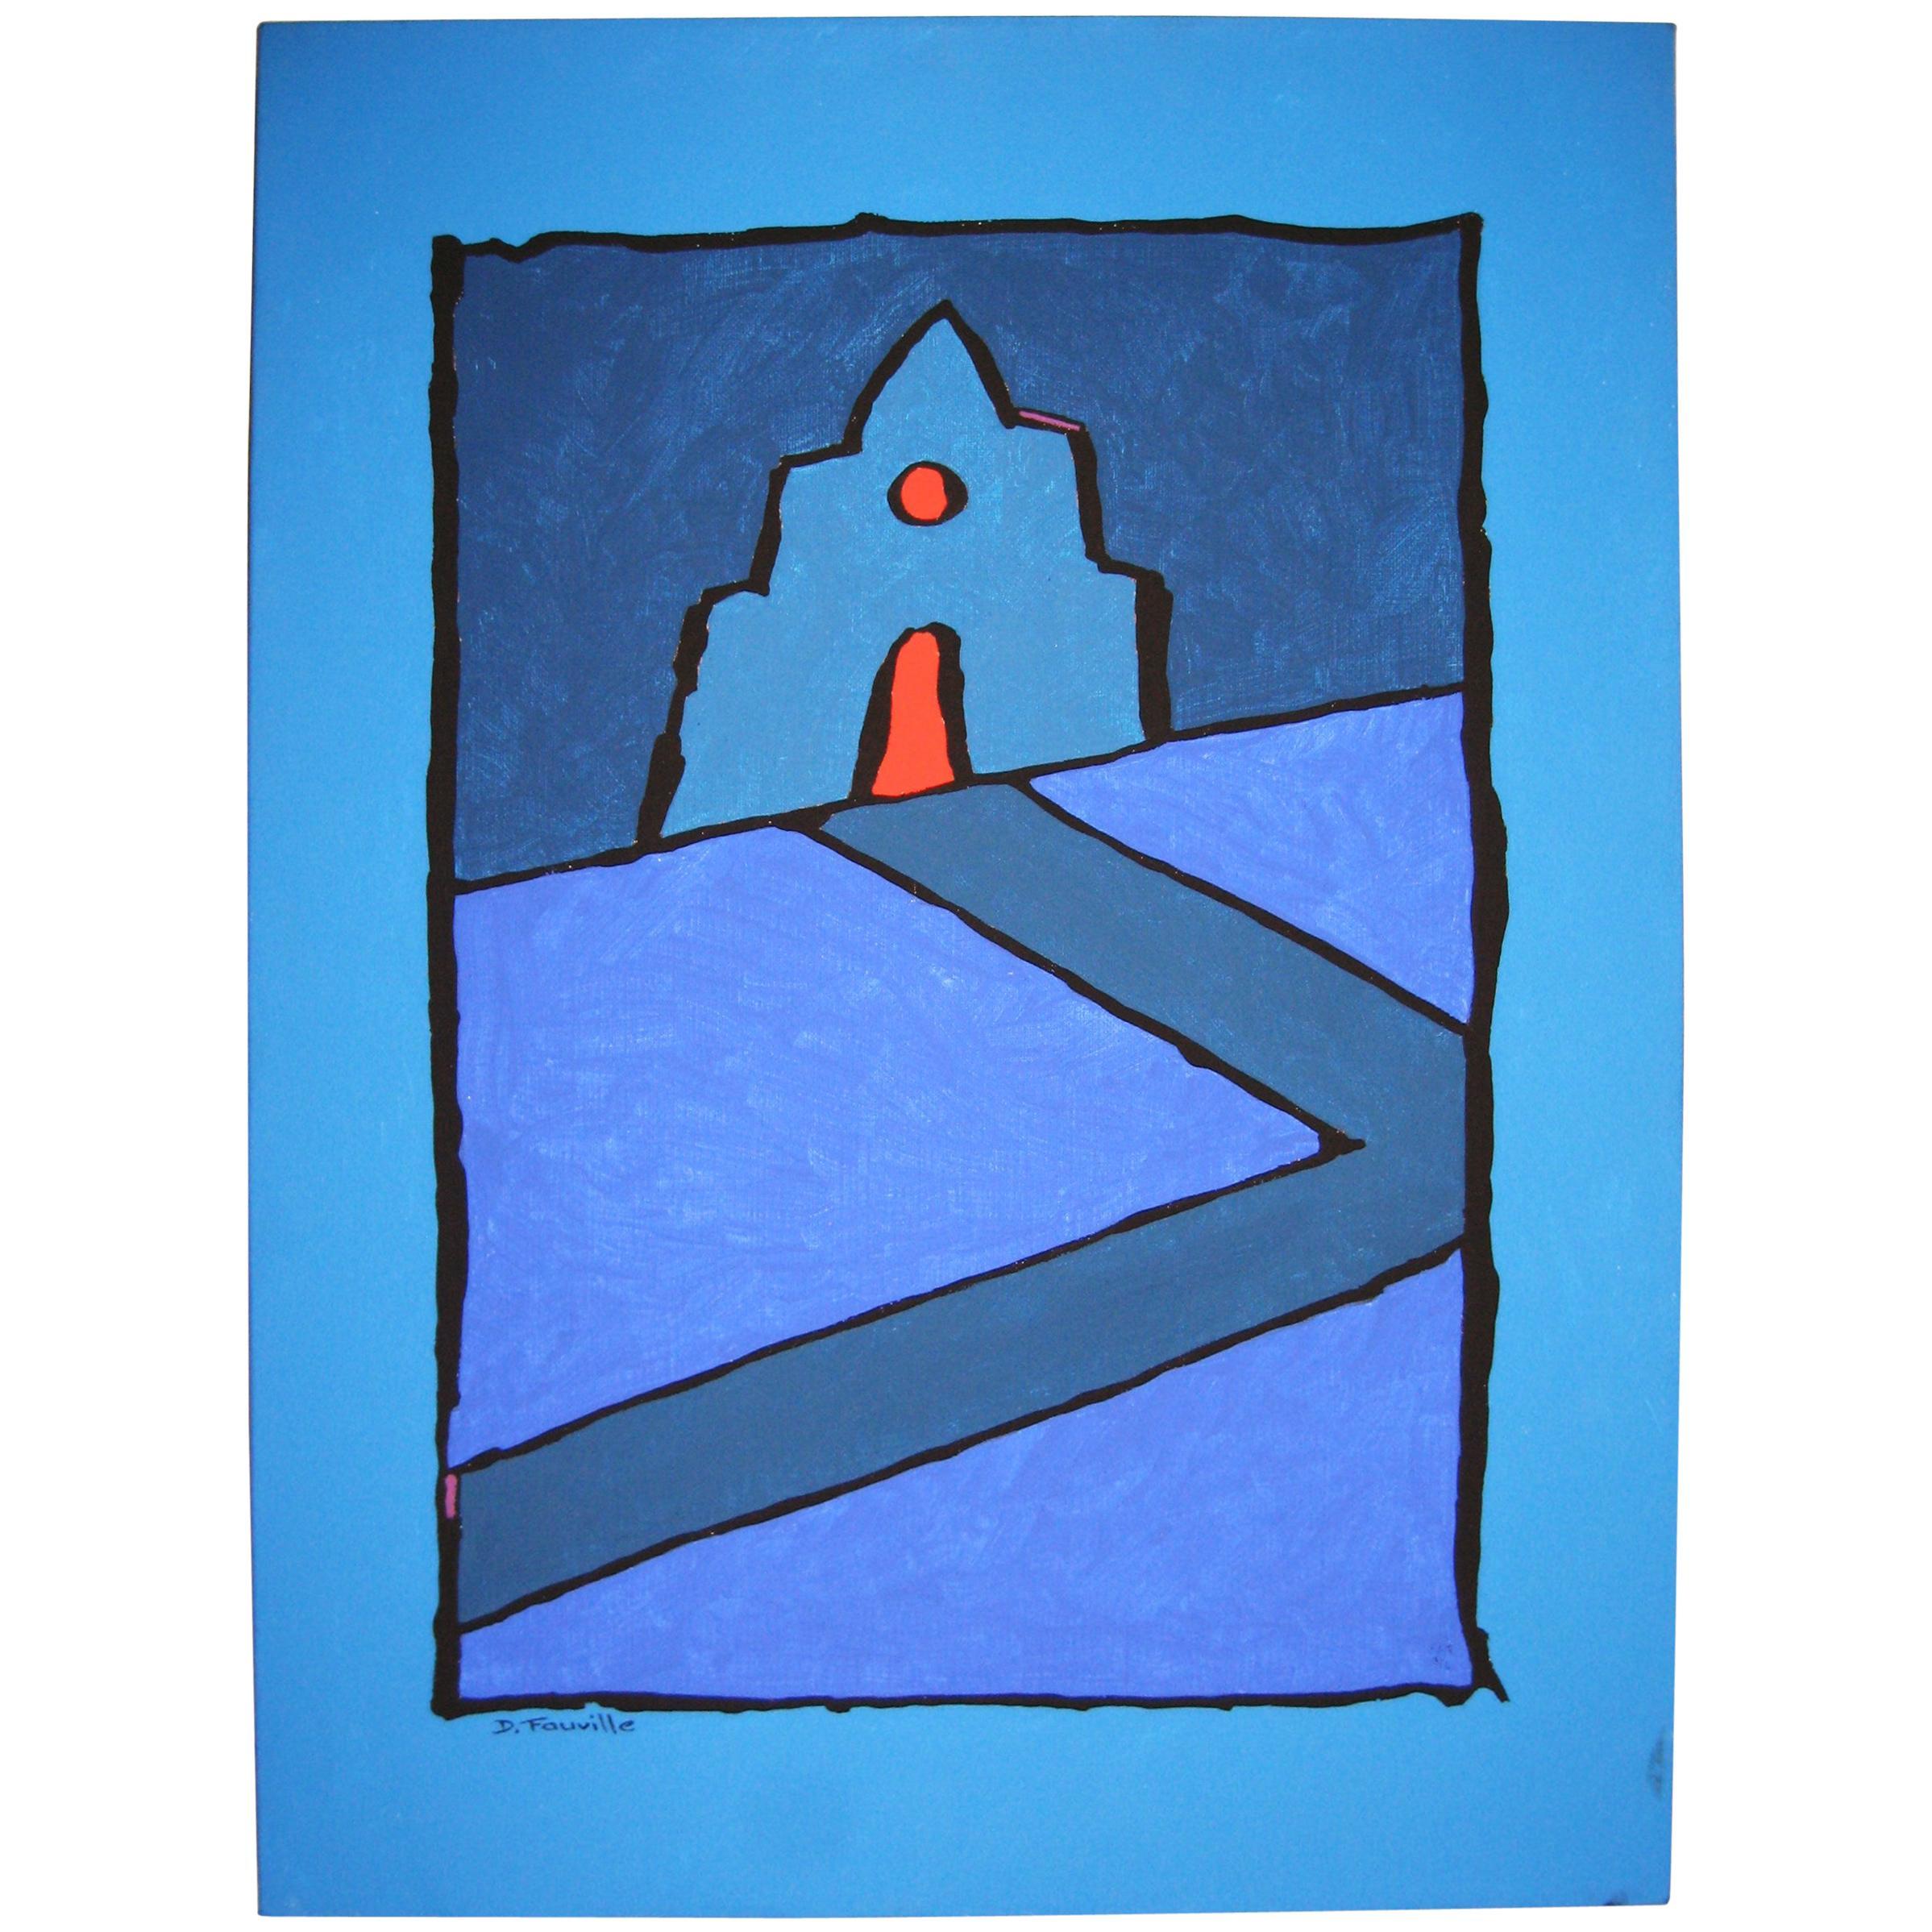 Daniel Fauville Castle, 2001